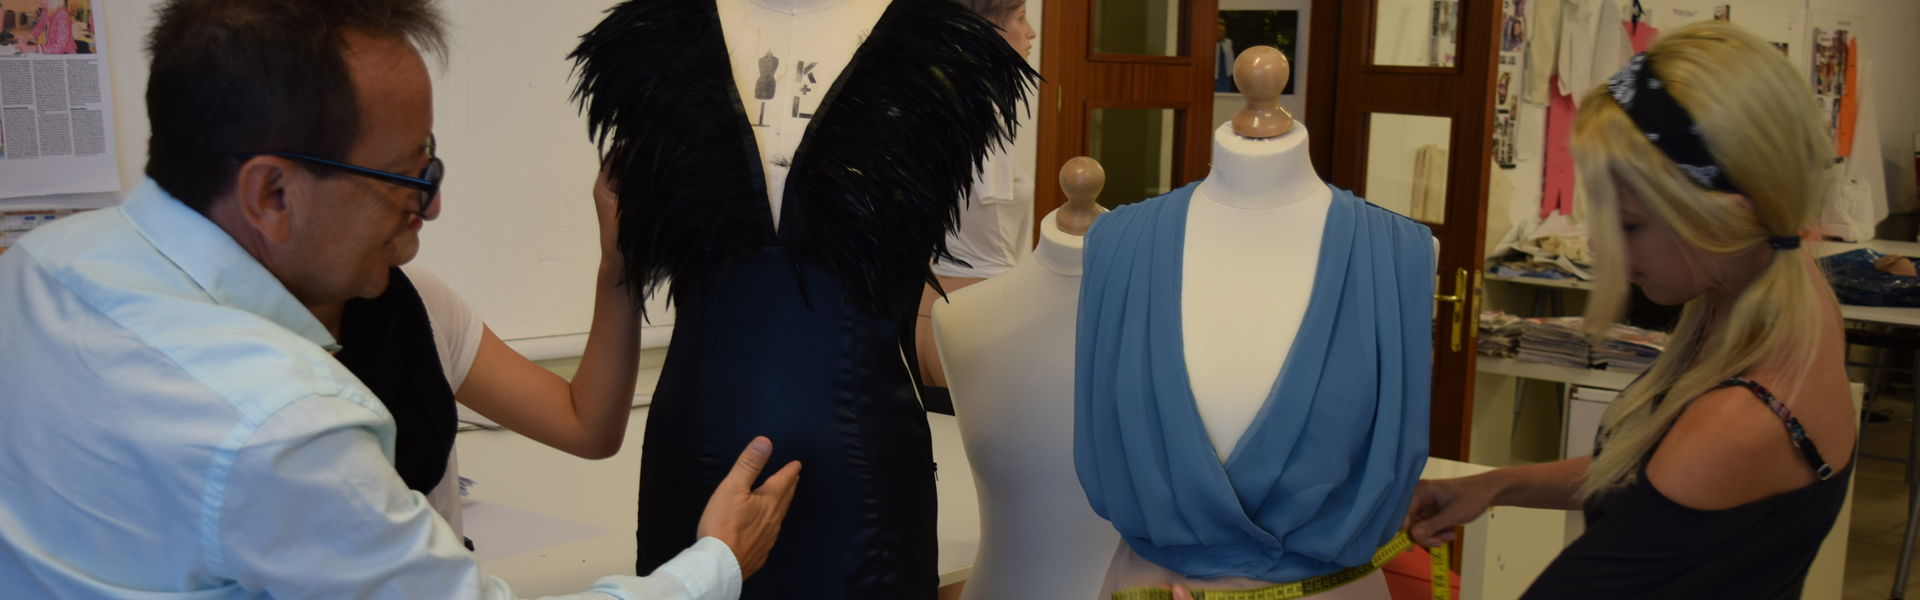 Marbella Design Academy - Fashion Design